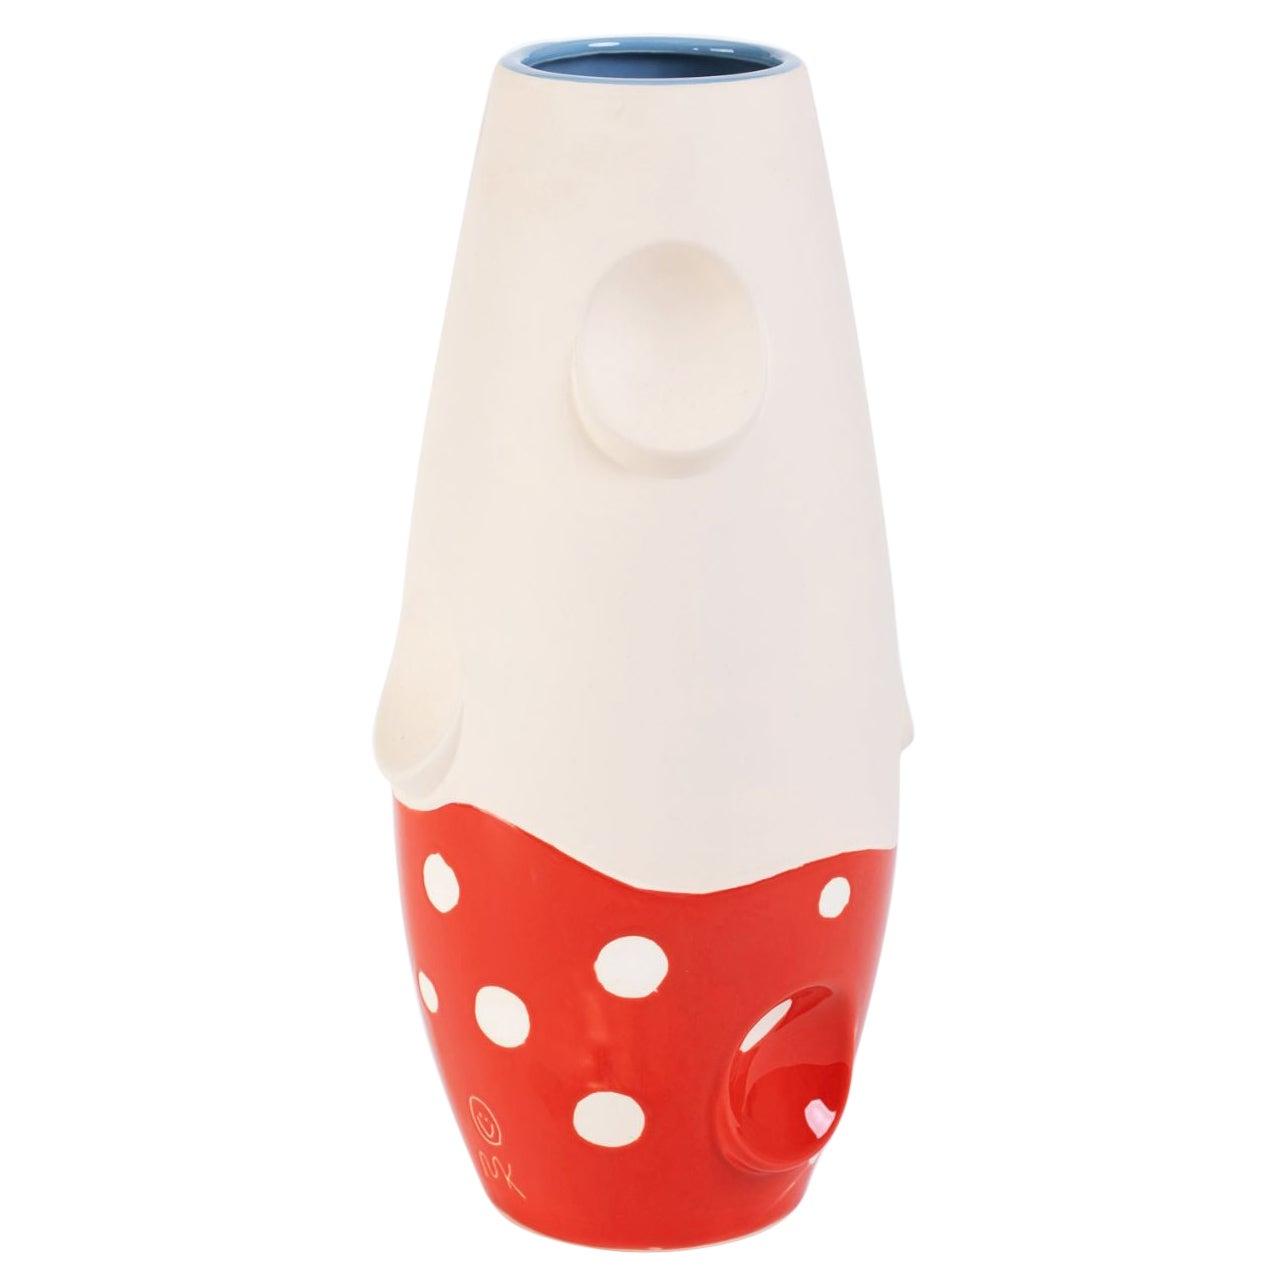 Oko Pop Ceramic Vase, Mushroom by Malwina Konopacka